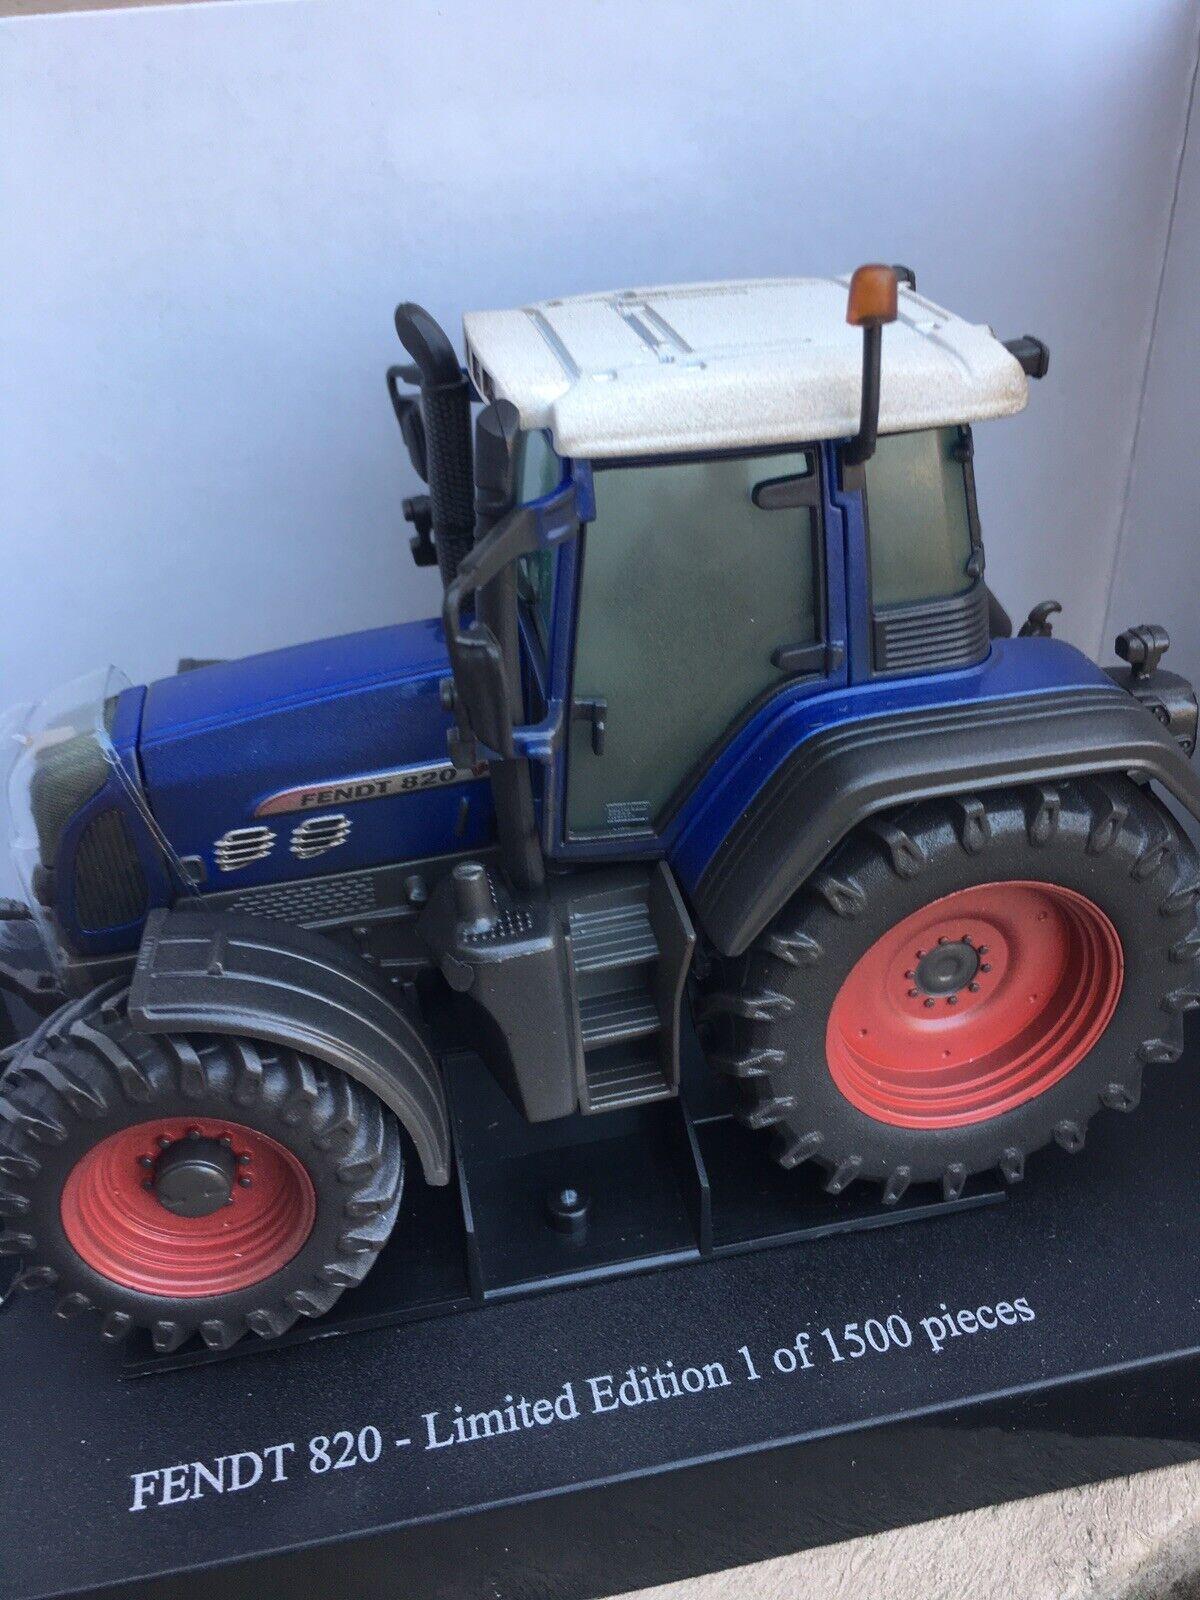 Dusty Weatherot Universal Hobbies Blau Fendt 820 Tractor 1 32 Scale TRAKTOR